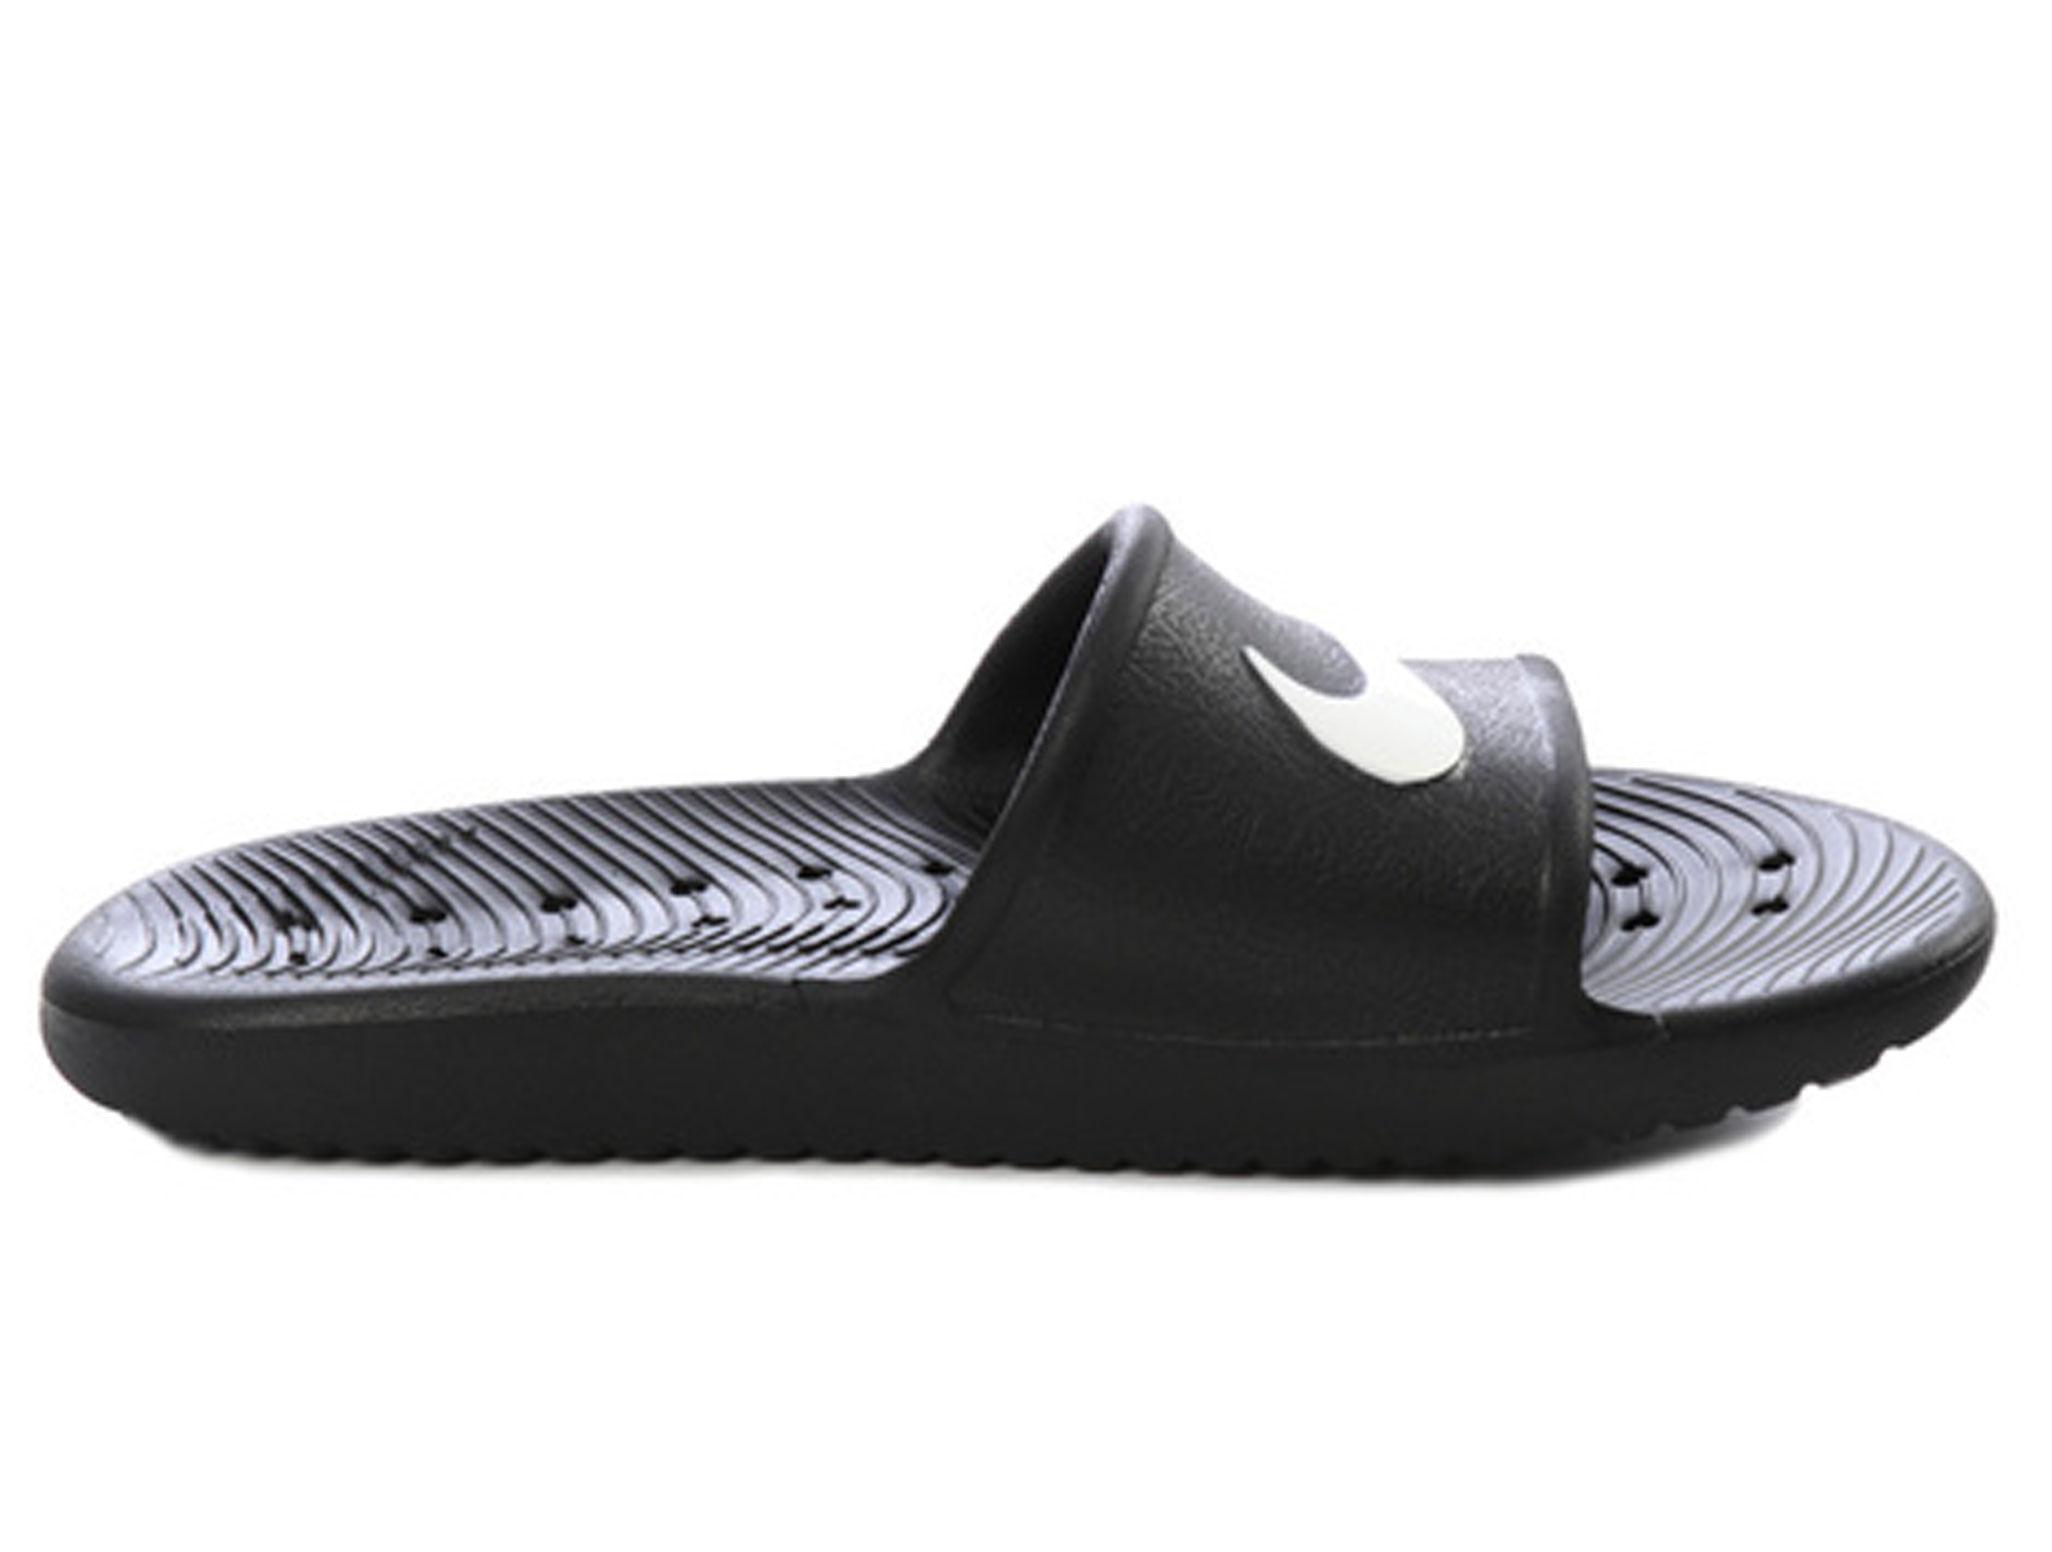 Campo de minas Derribar traje  Sandalias Nike Kawa Shower Para Hombre 832655-001 - surtidoradepartamental